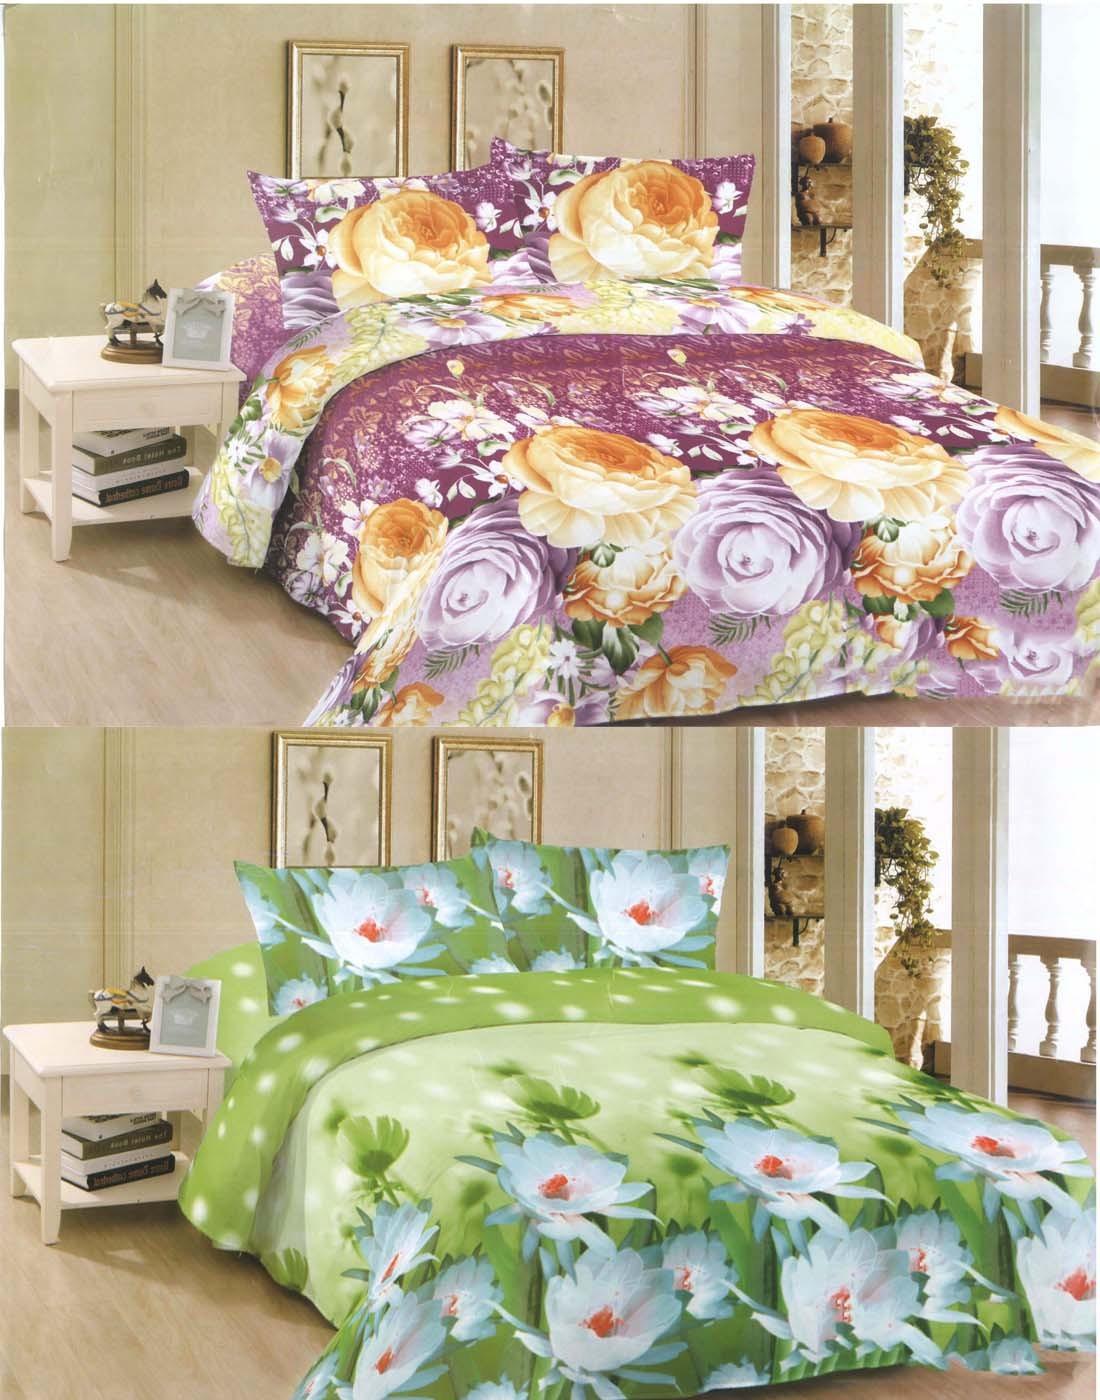 Flipkart - Set of 2 Double Bedsheets Just @ Rs.509